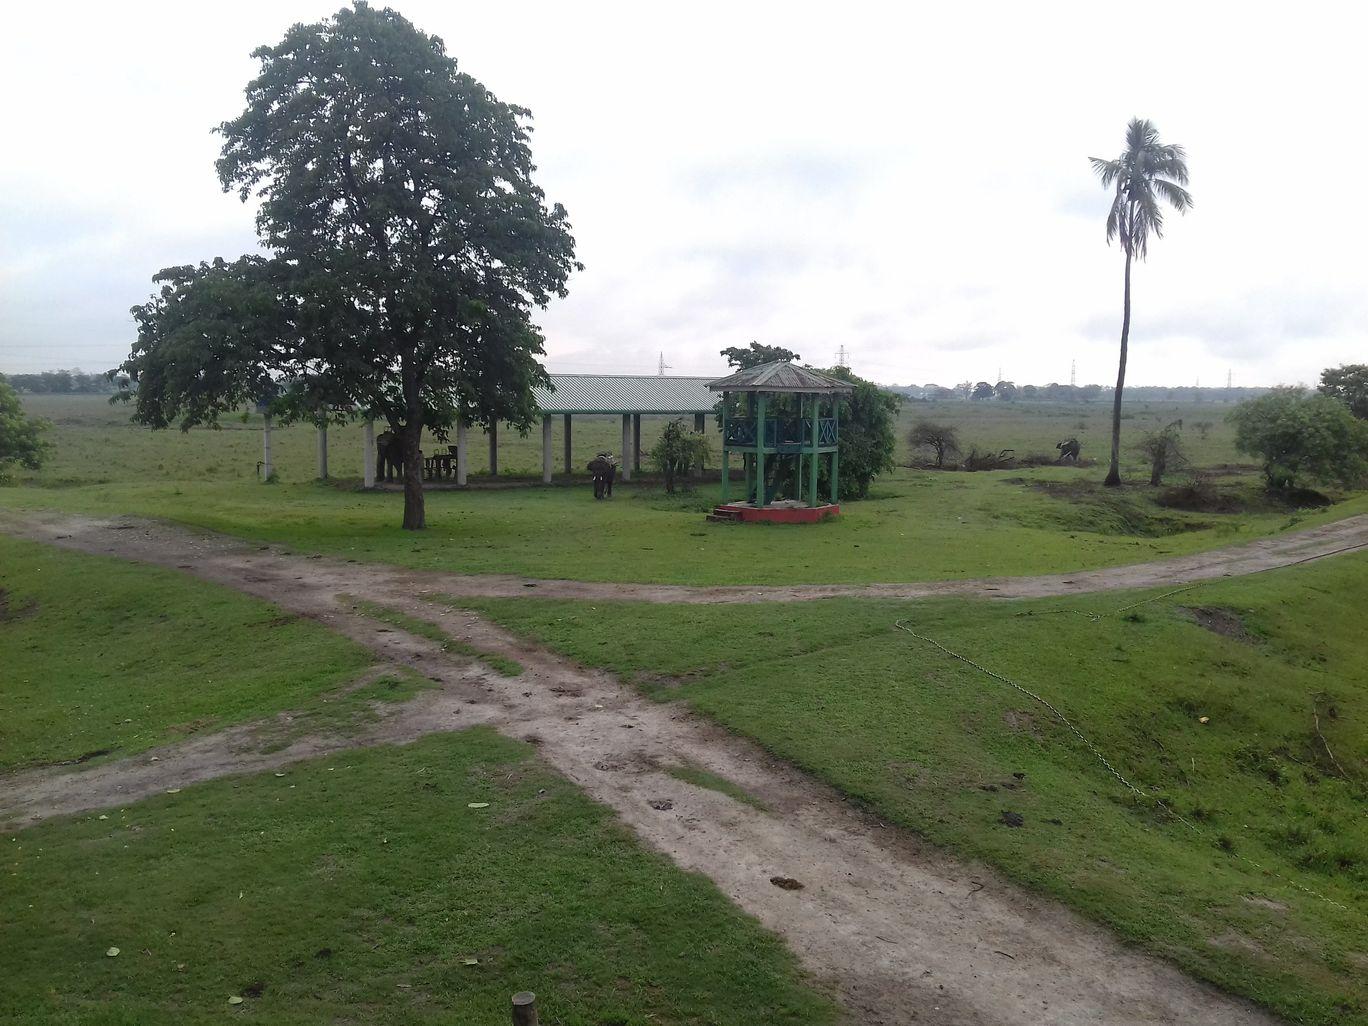 Photo of Pobitora Wildlife Sanctuary By Ankita Hazarika